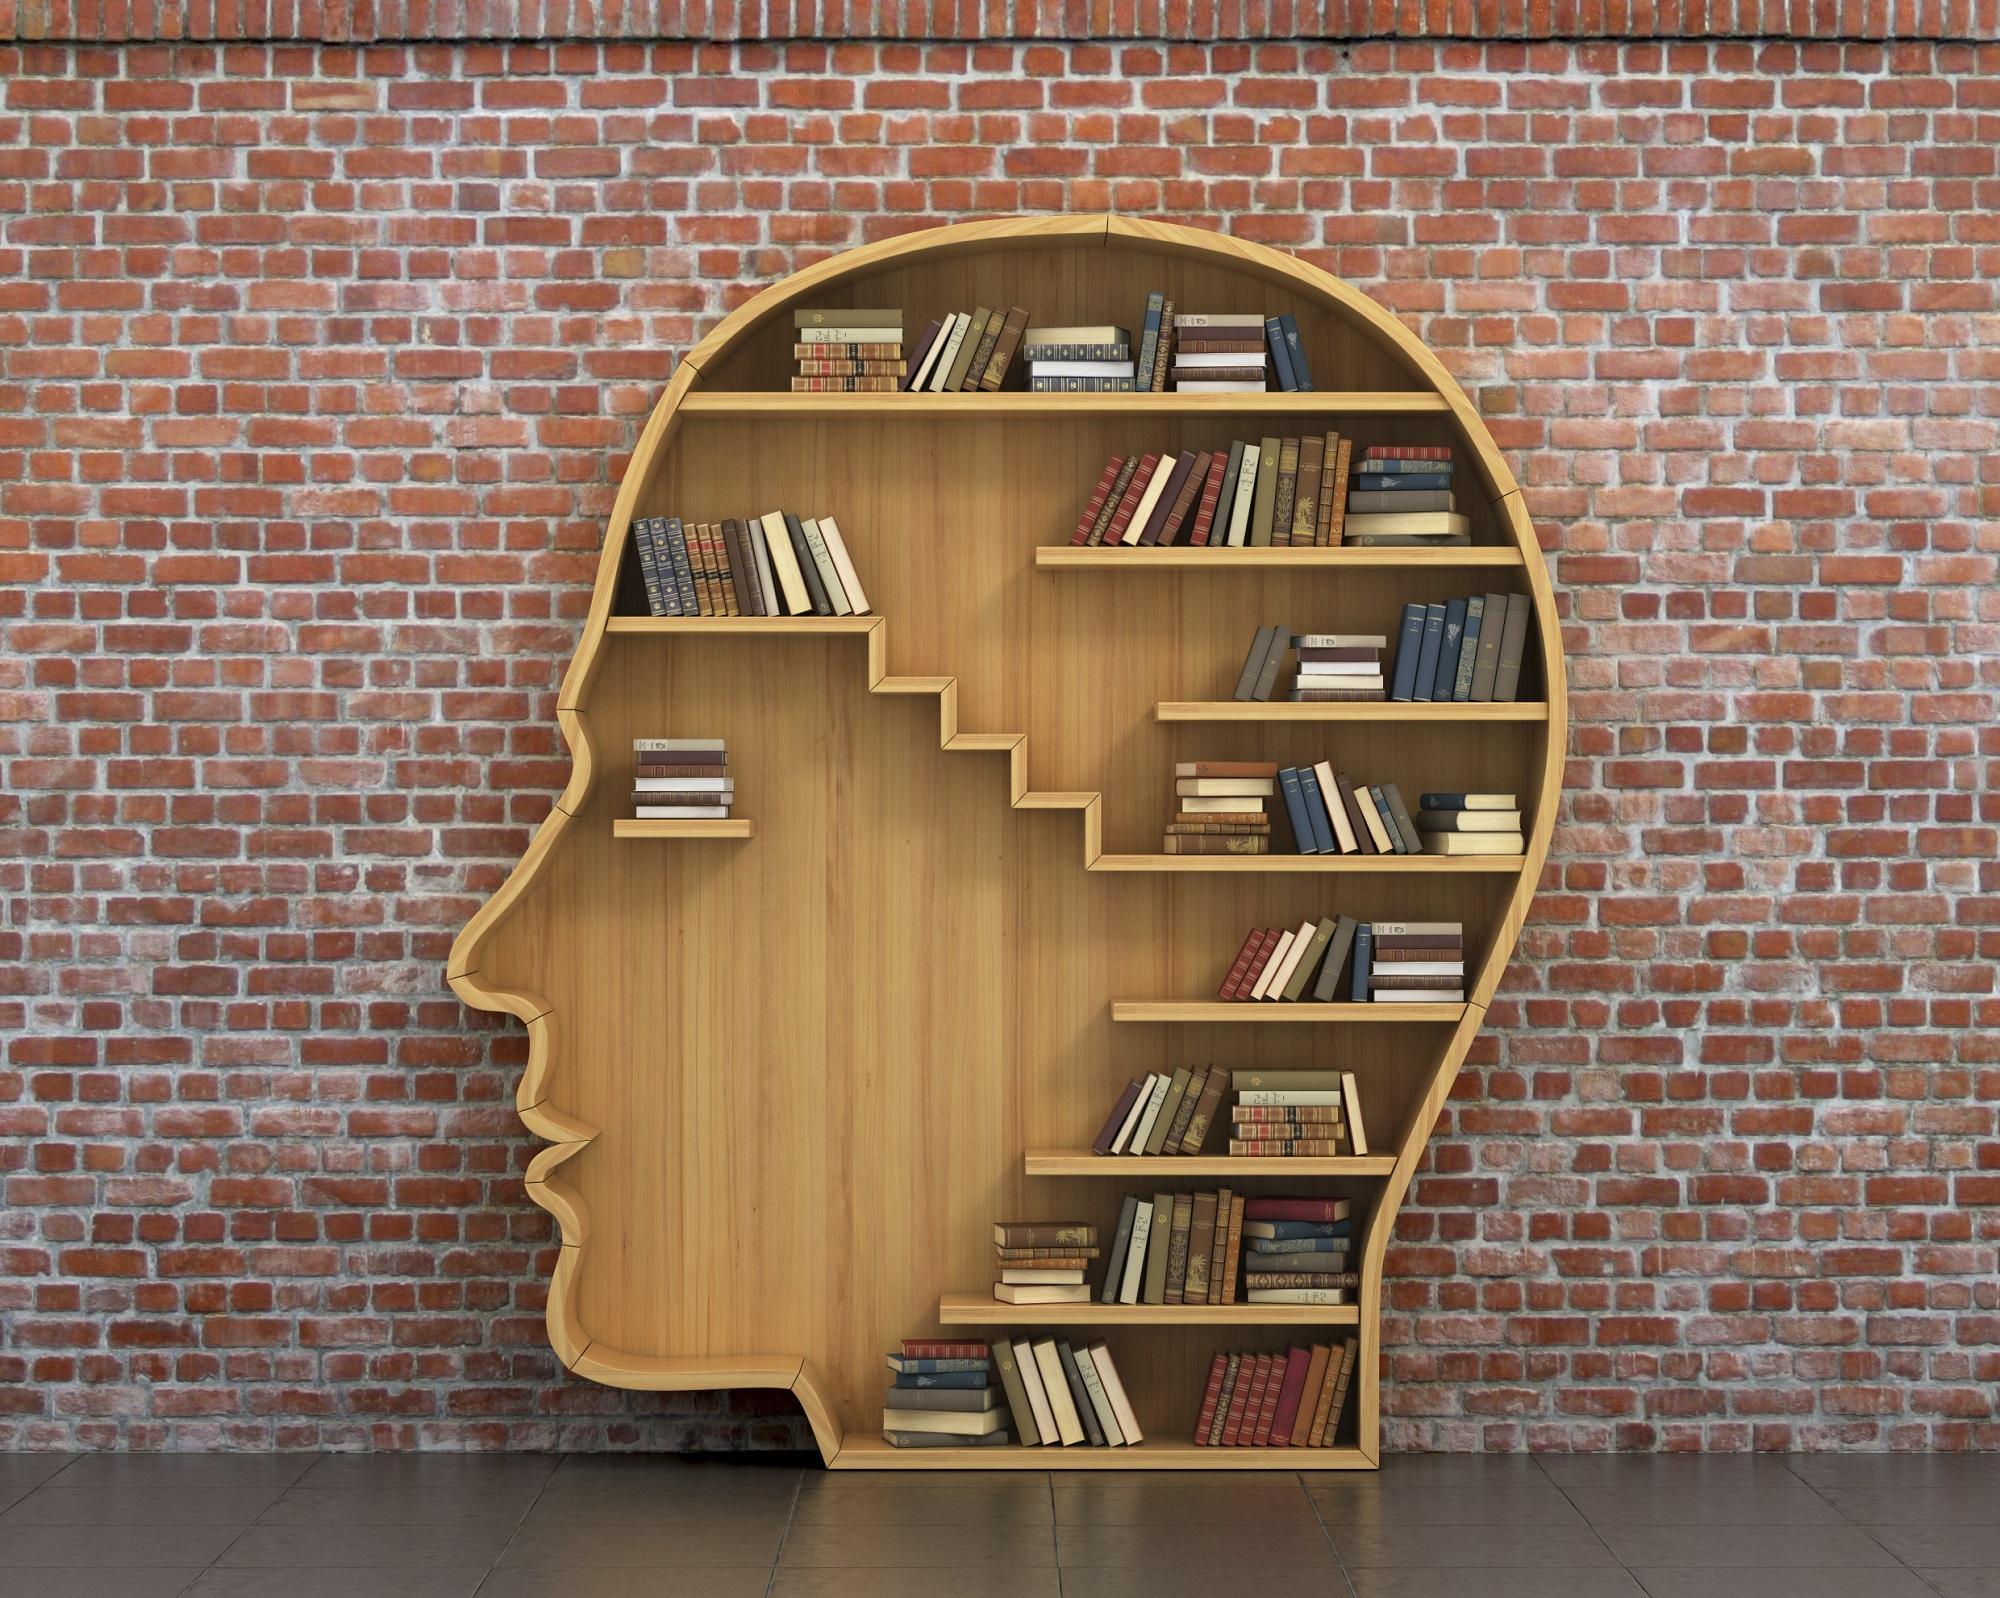 Literature Distribution Policy